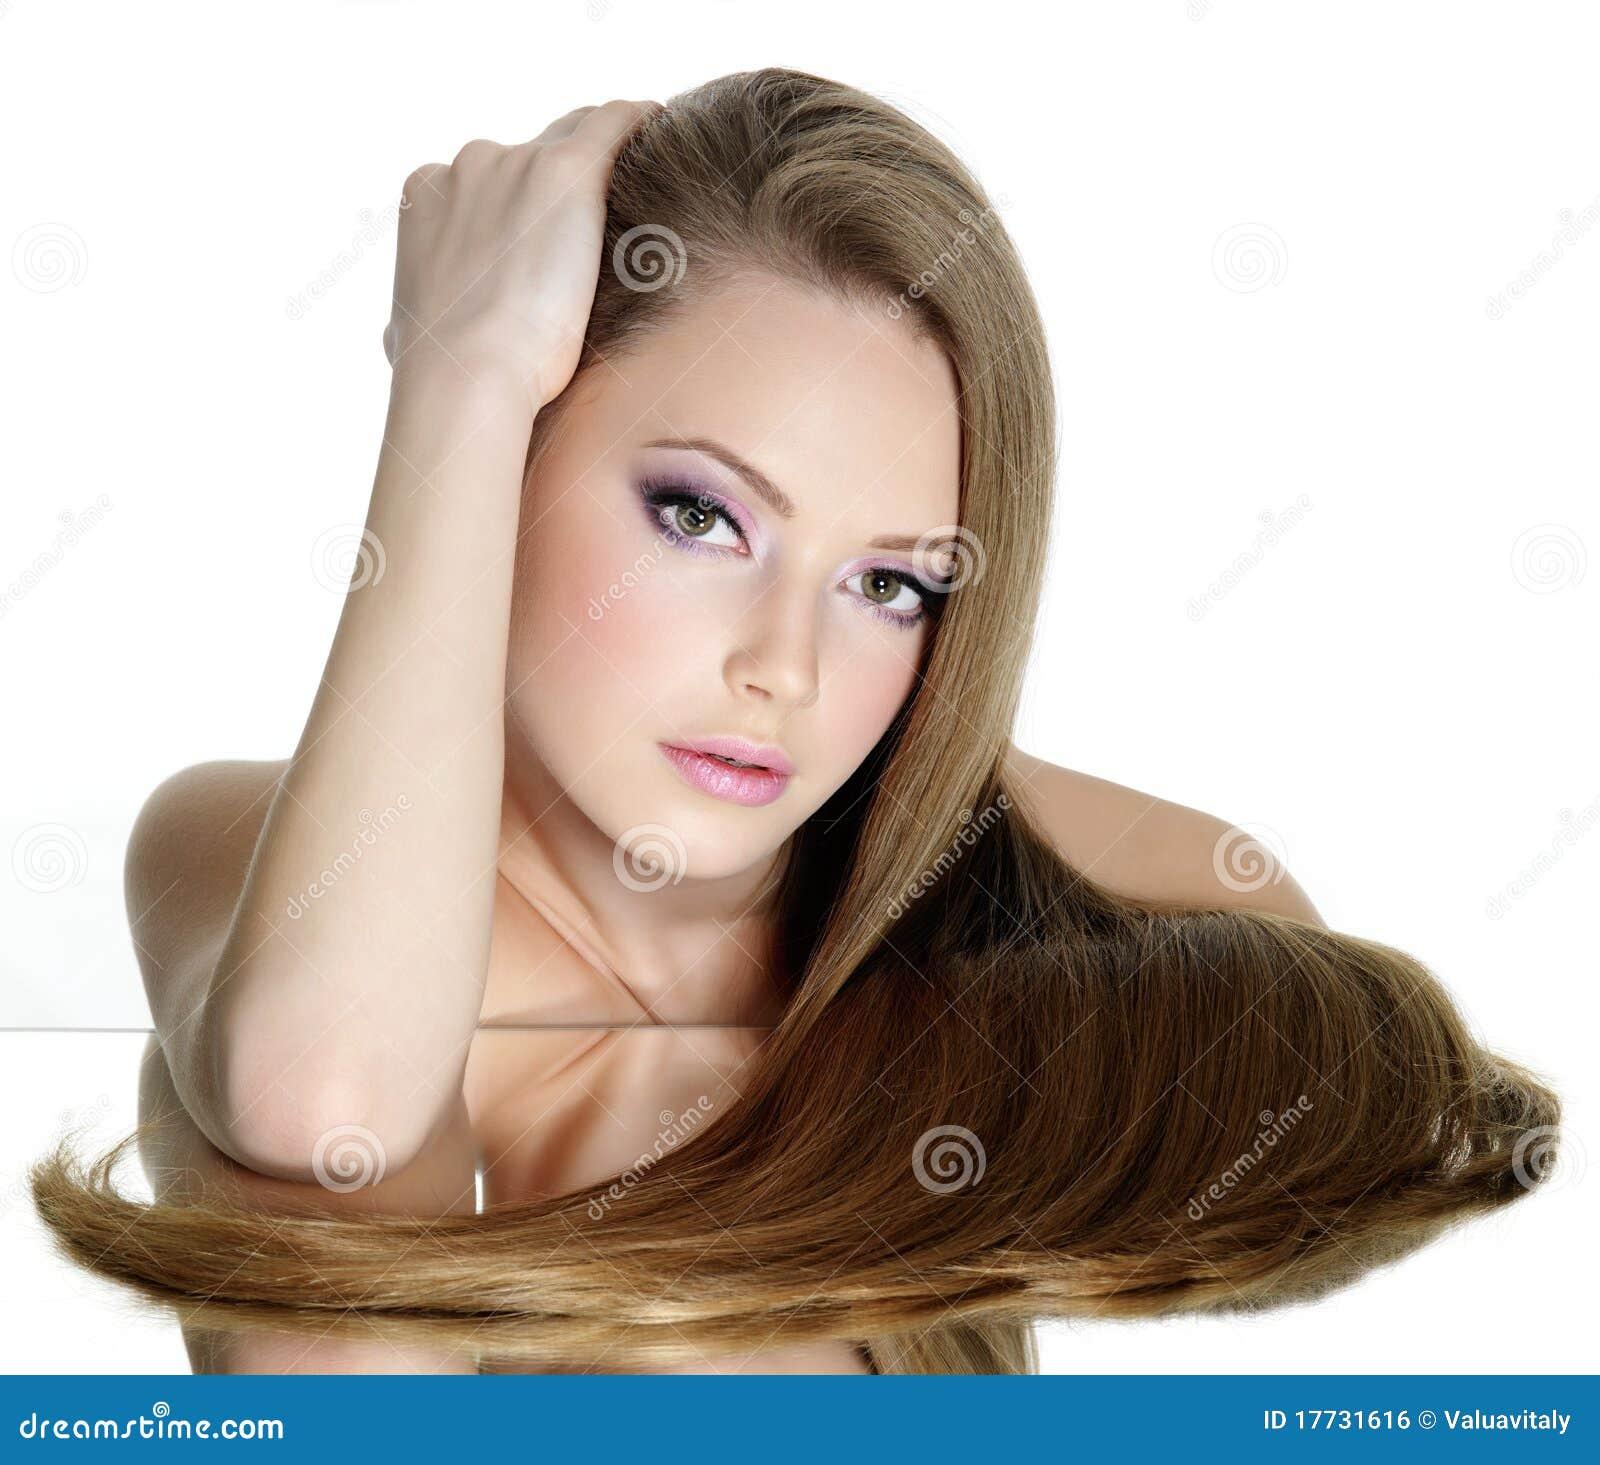 333 brunette teen think